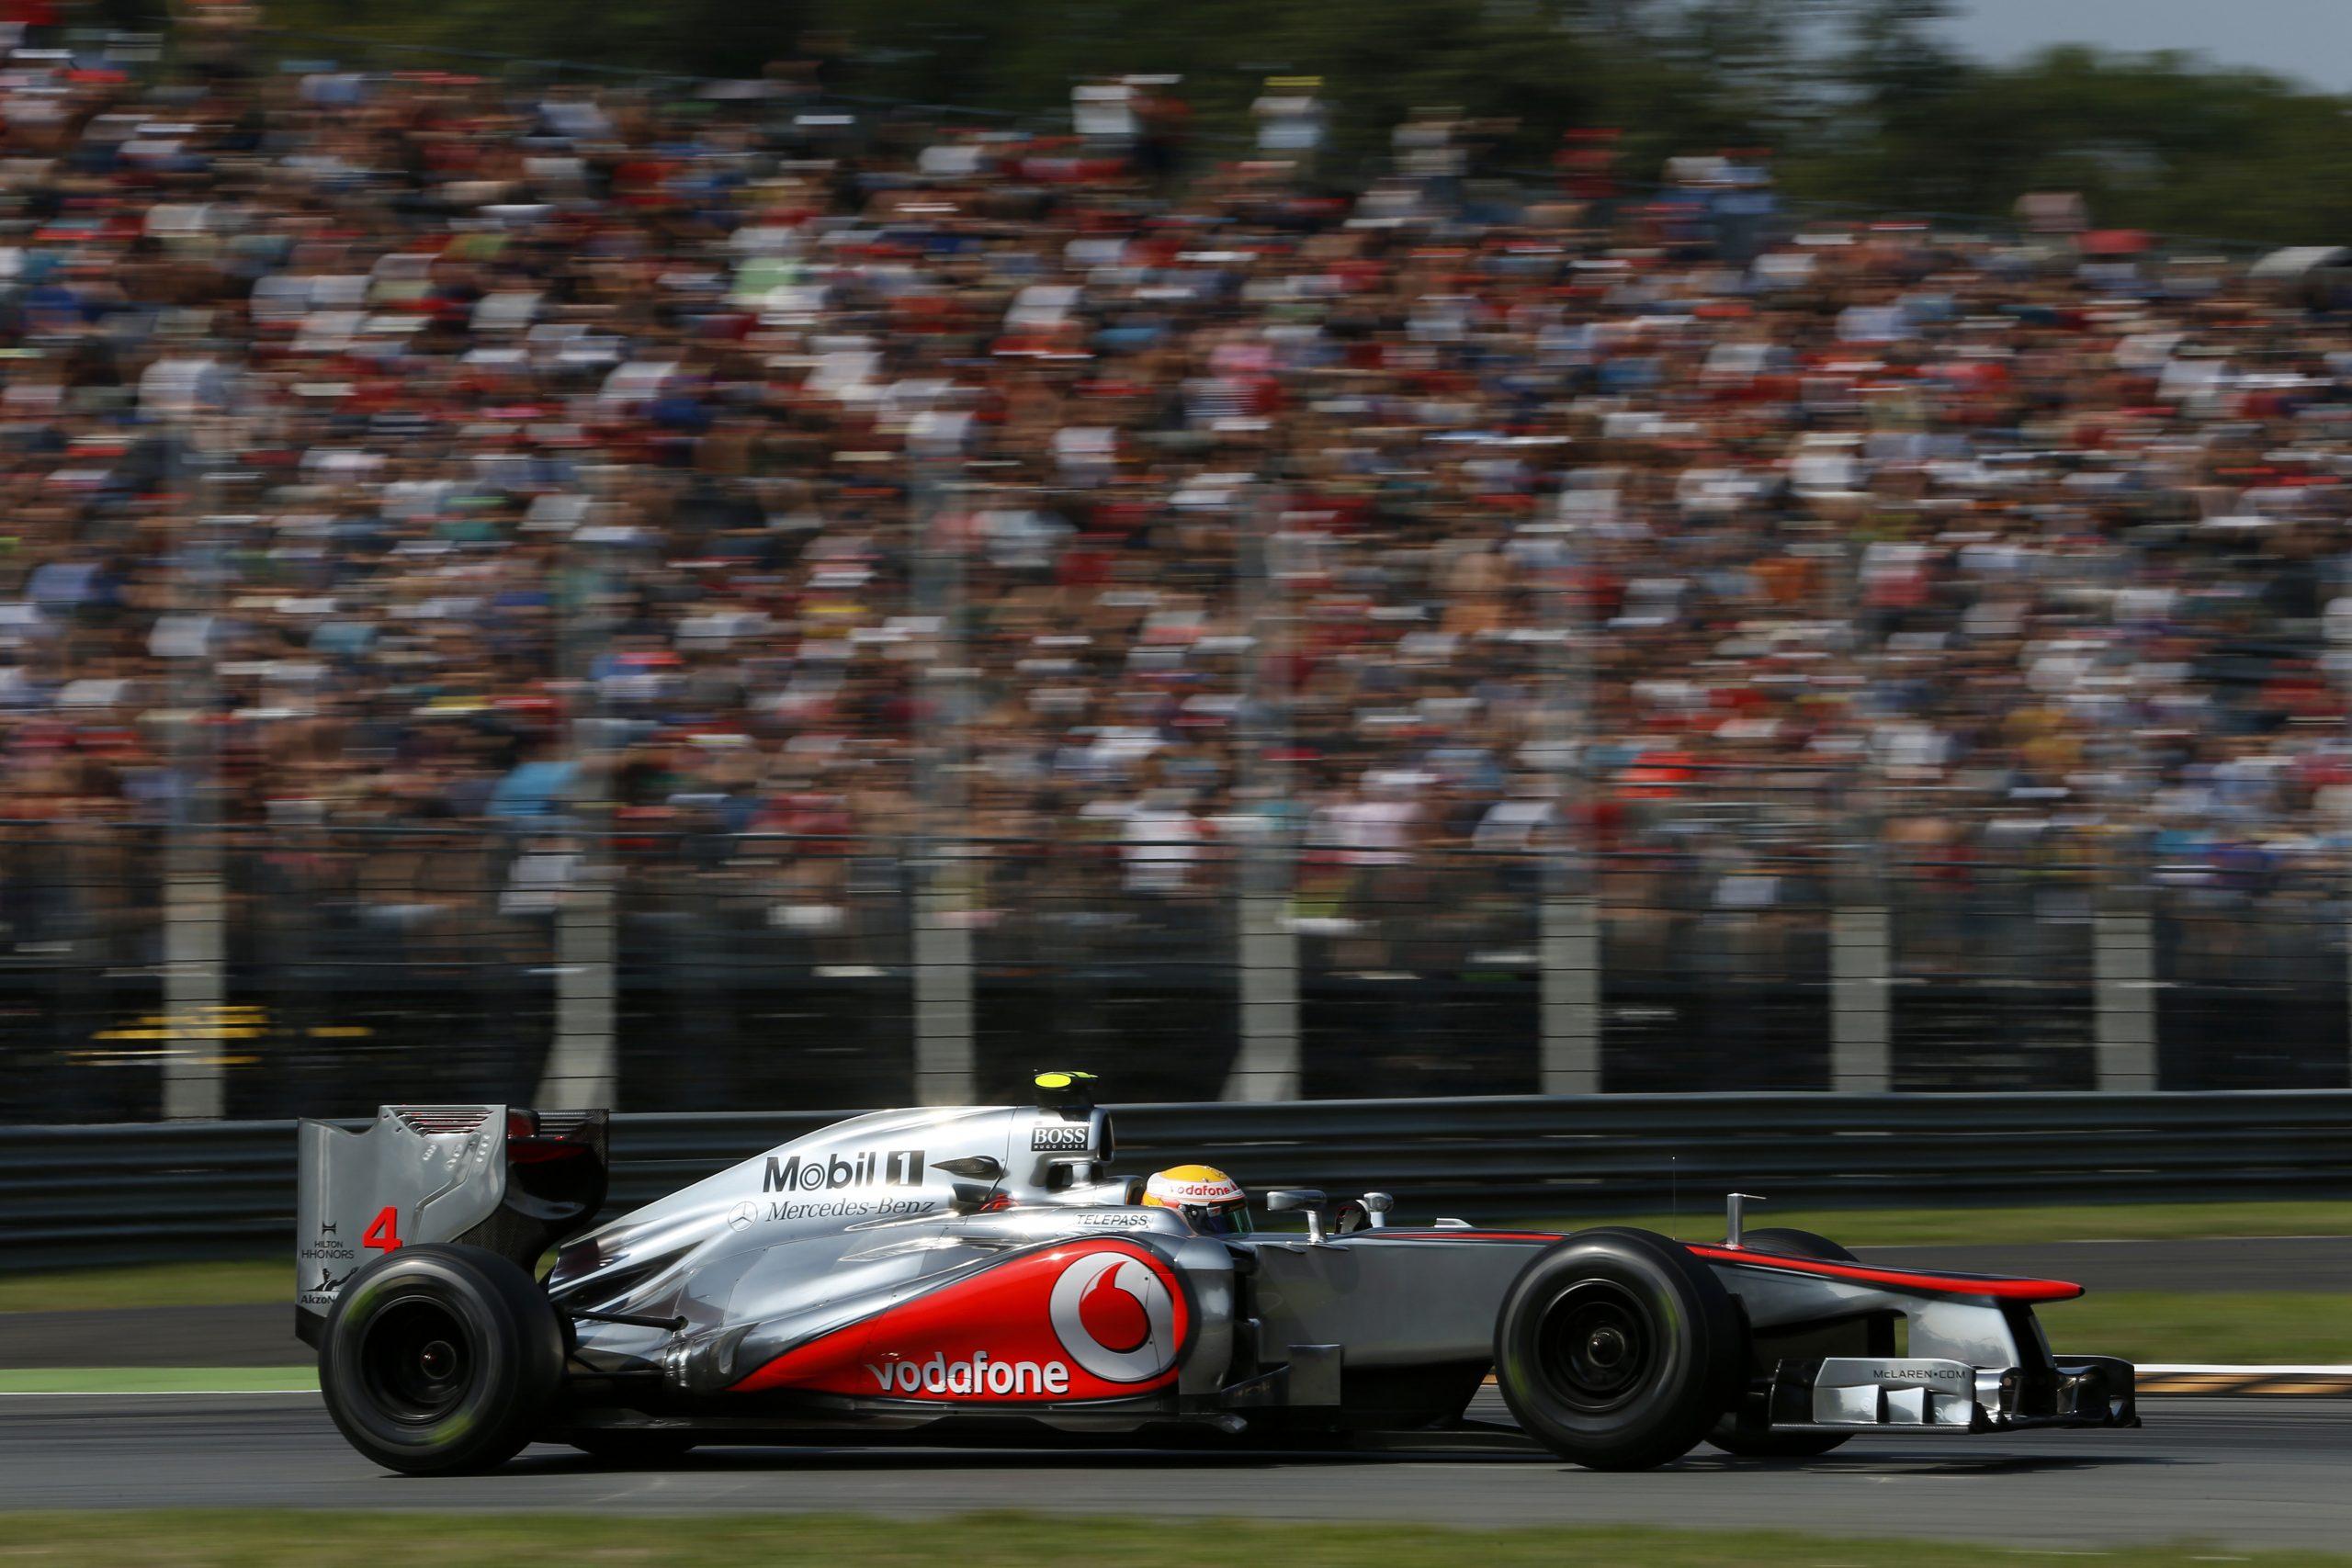 Formula One World Championship, Rd 13, Italian Grand Prix, Practice, Monza, Italy, Friday 7 September 2012.